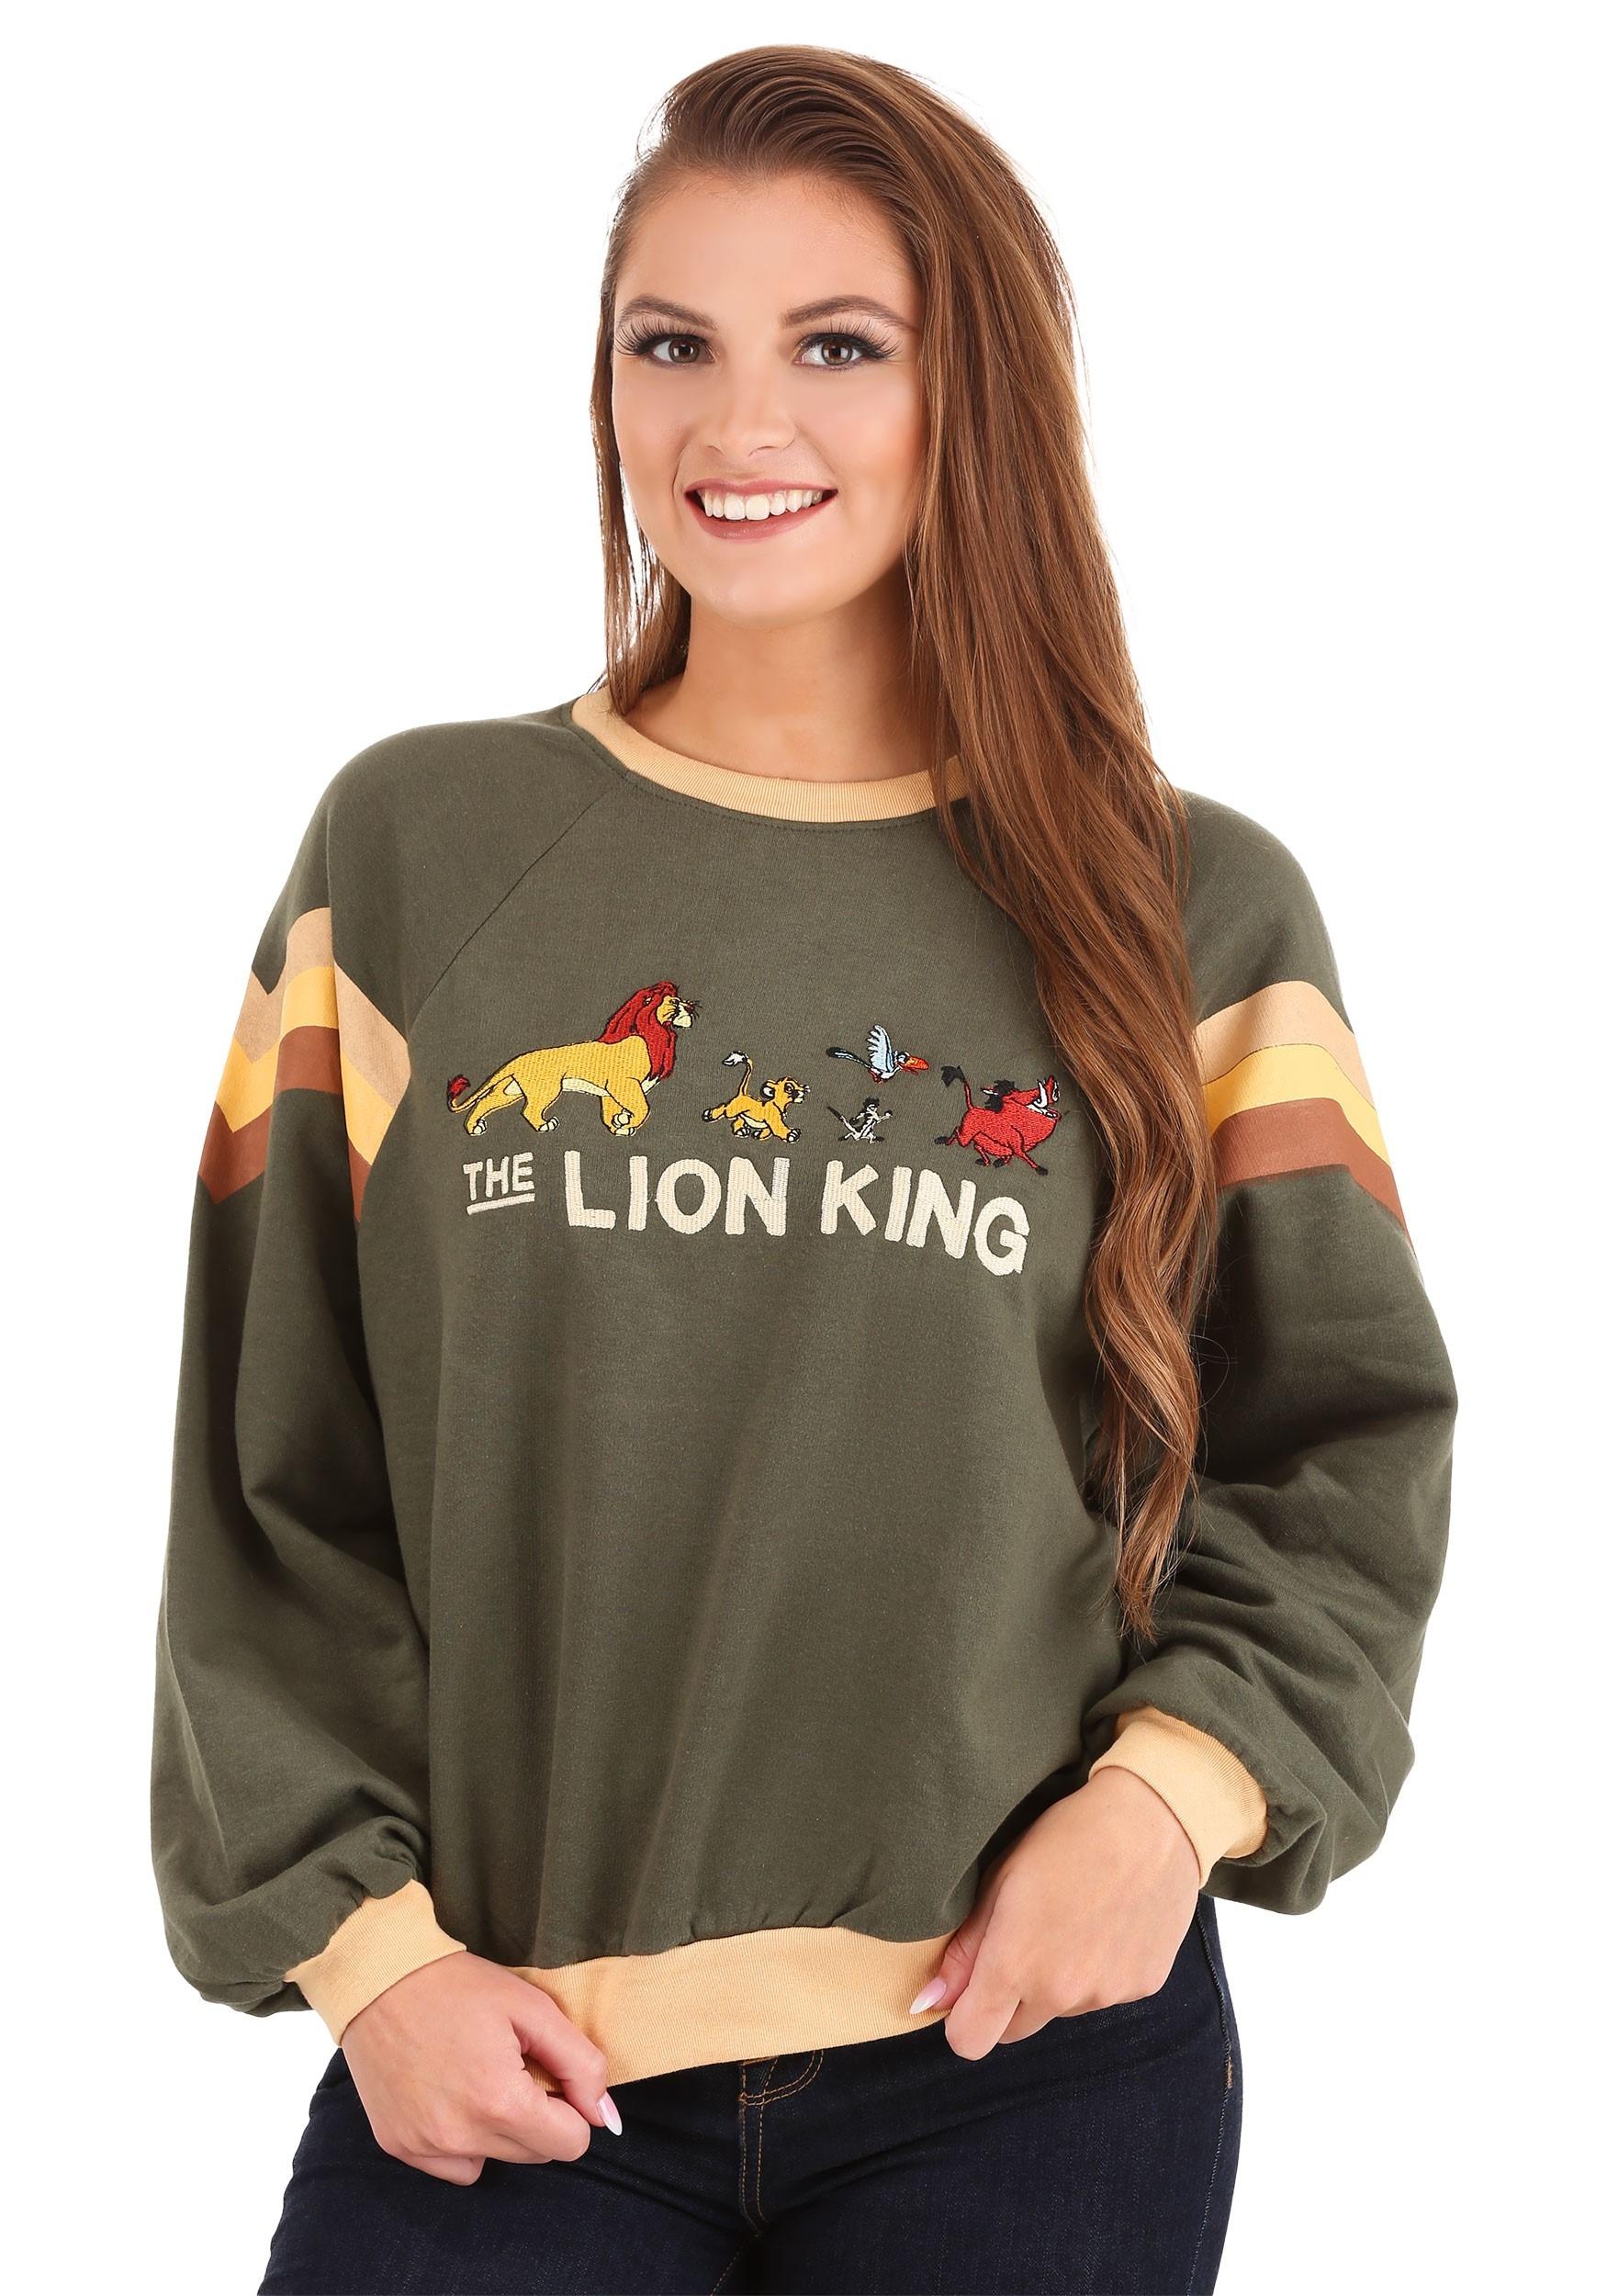 The Lion King Raglan Contrast Ringer Sweater for Women